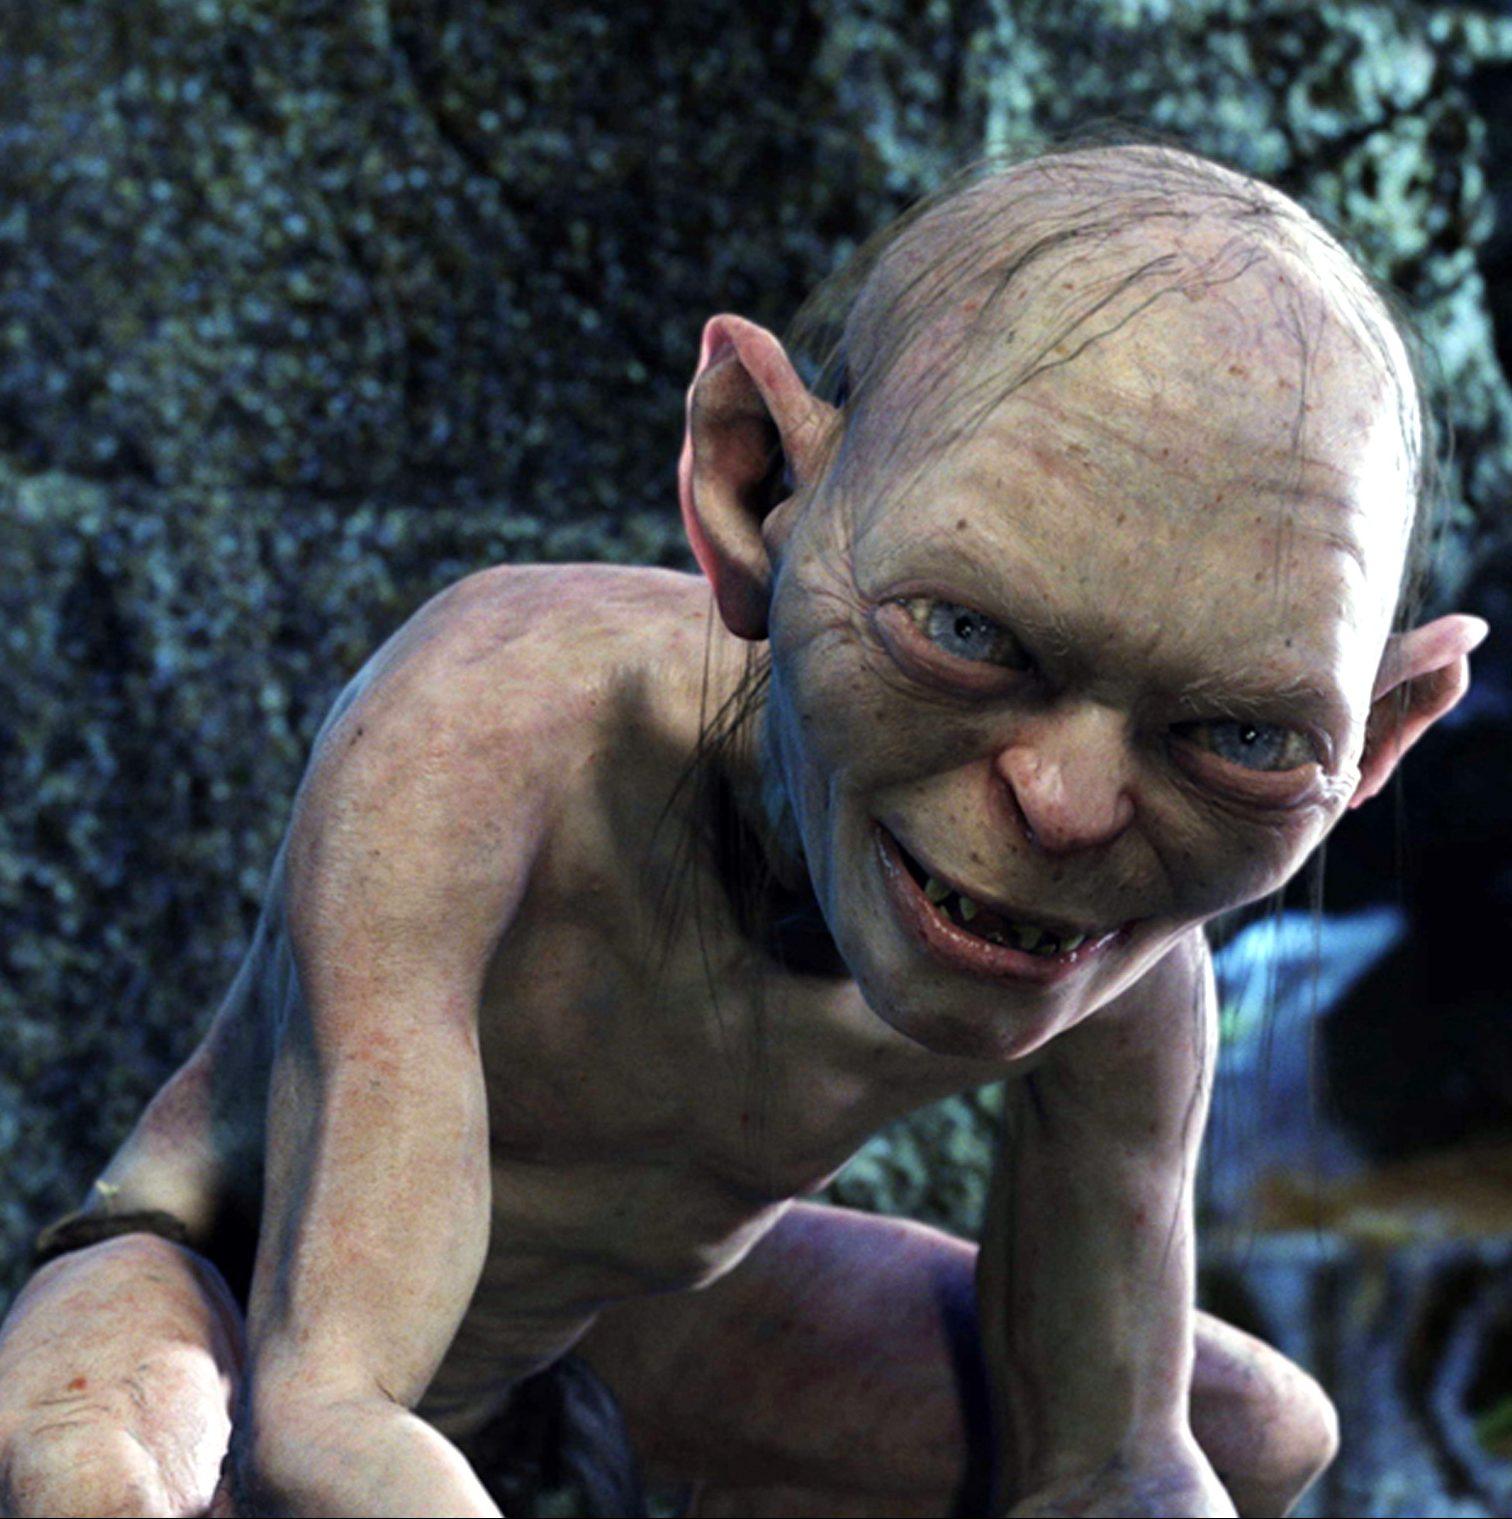 gollum4 e1584535380468 The 20 Best CGI Movie Monsters Ever